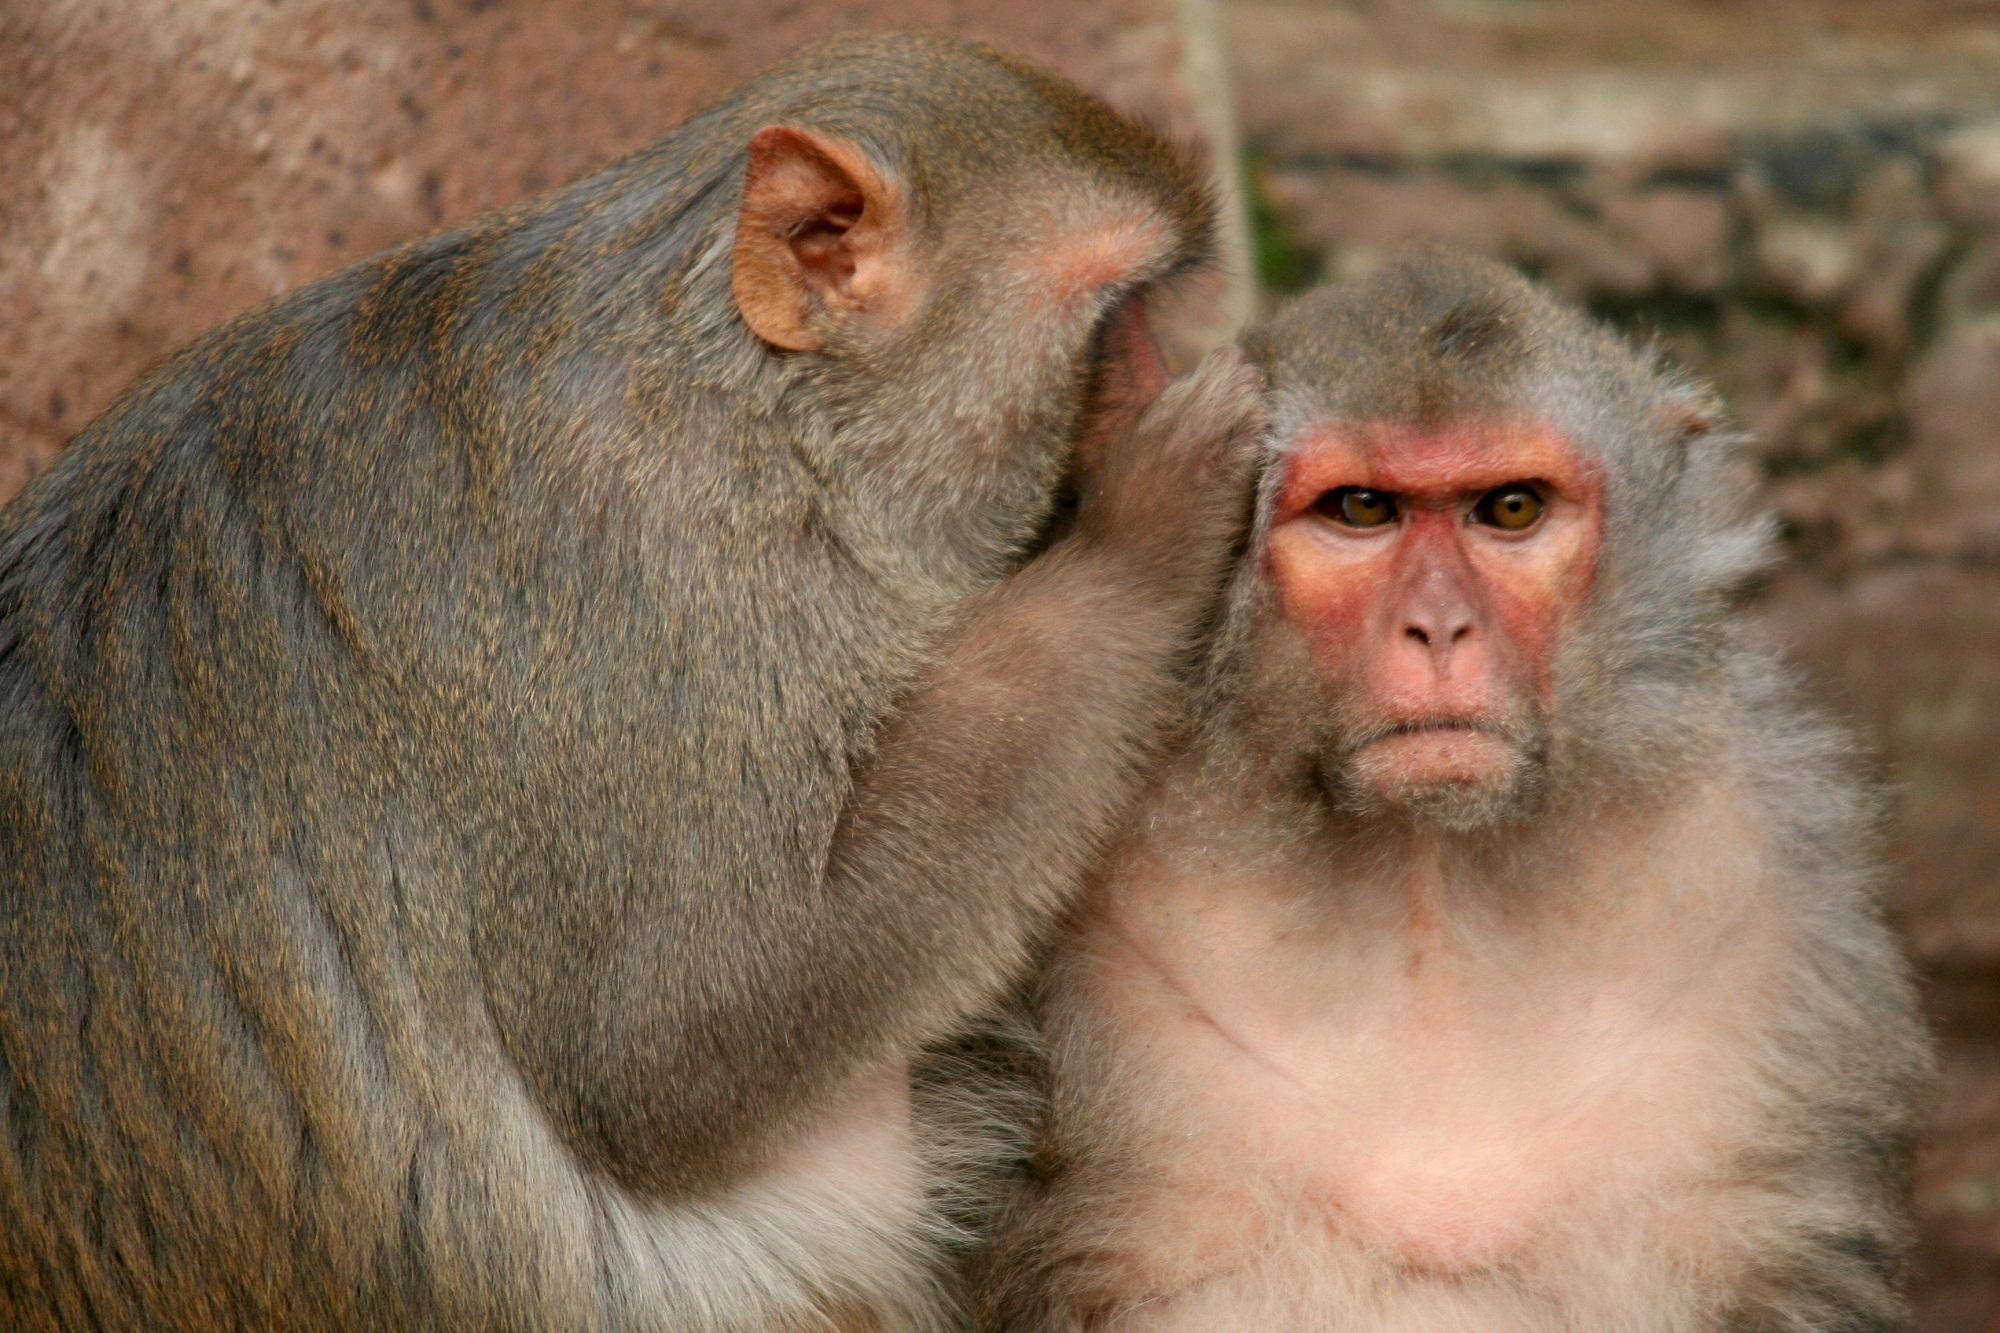 images of monkeys nice